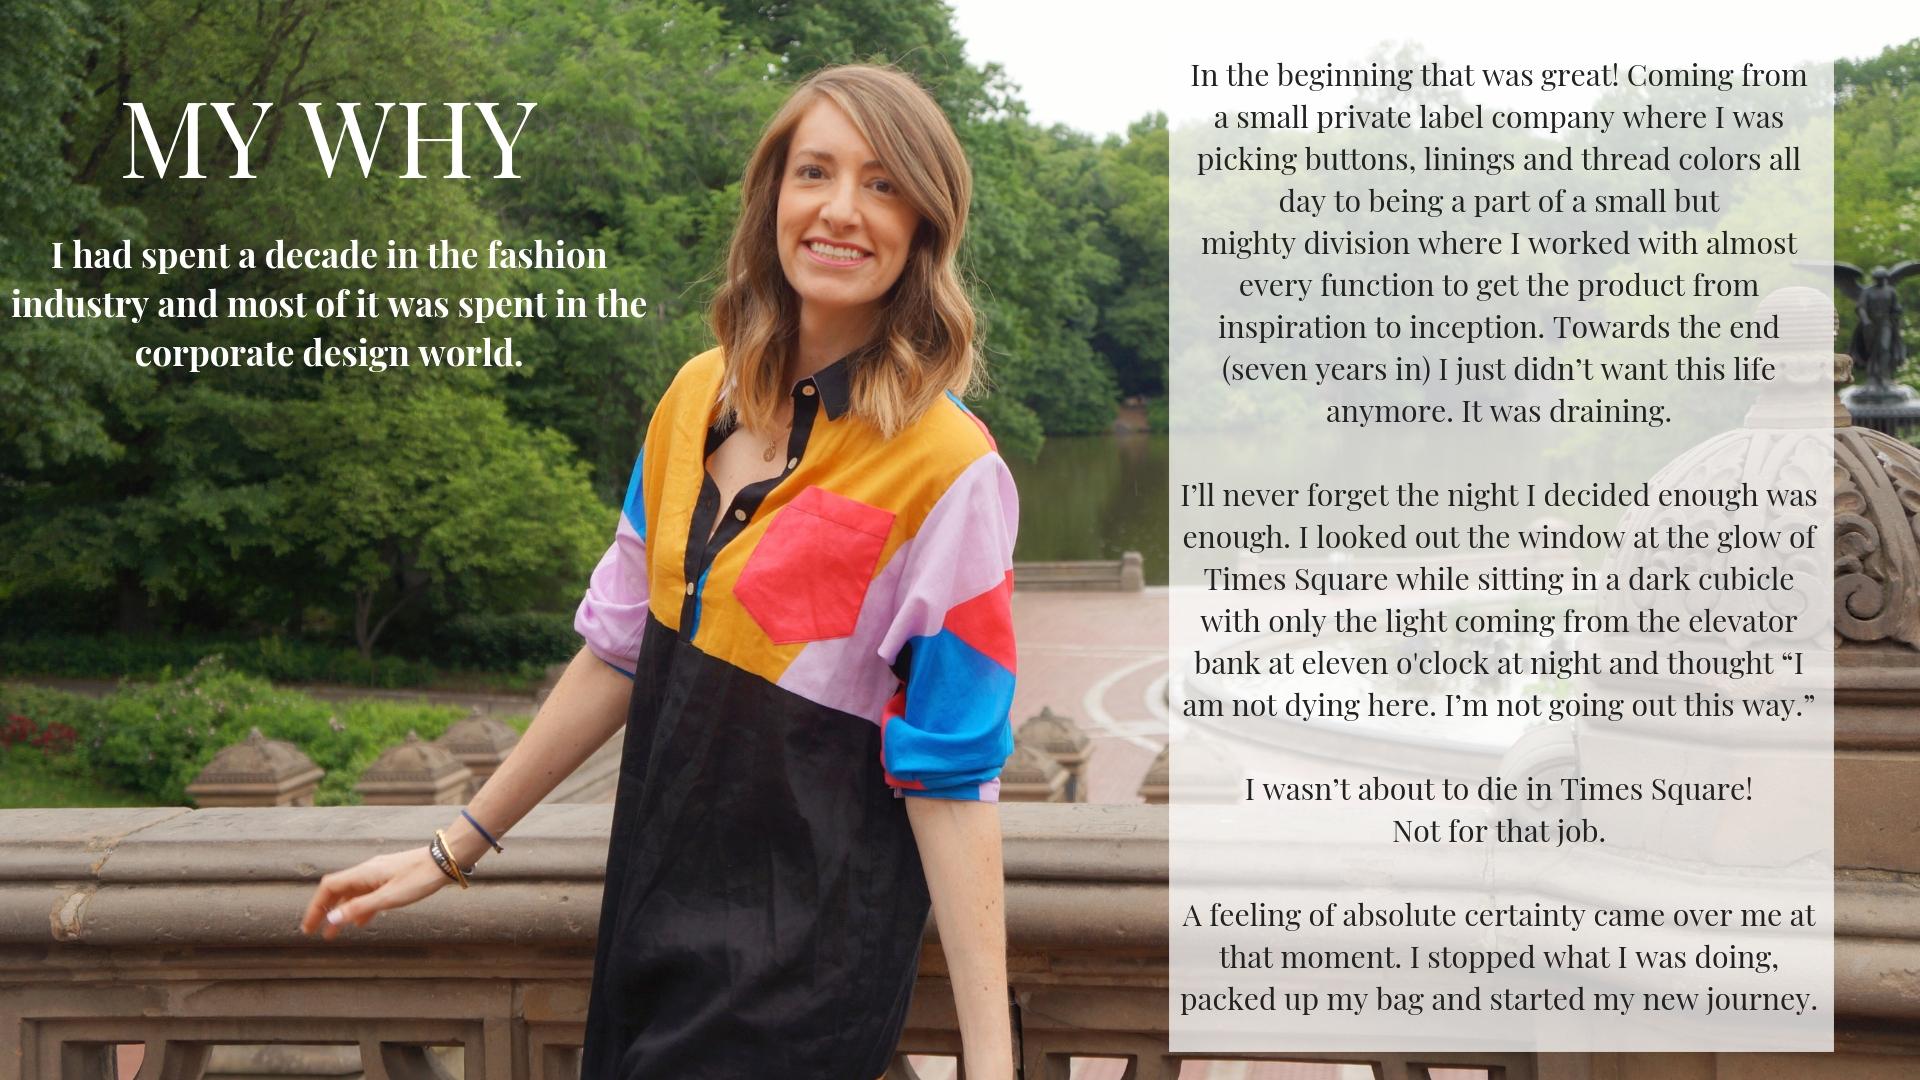 My_Why_Allie_Brandwein_image_wardrobe_consultant_virtual_stylist_nyc (4).jpg